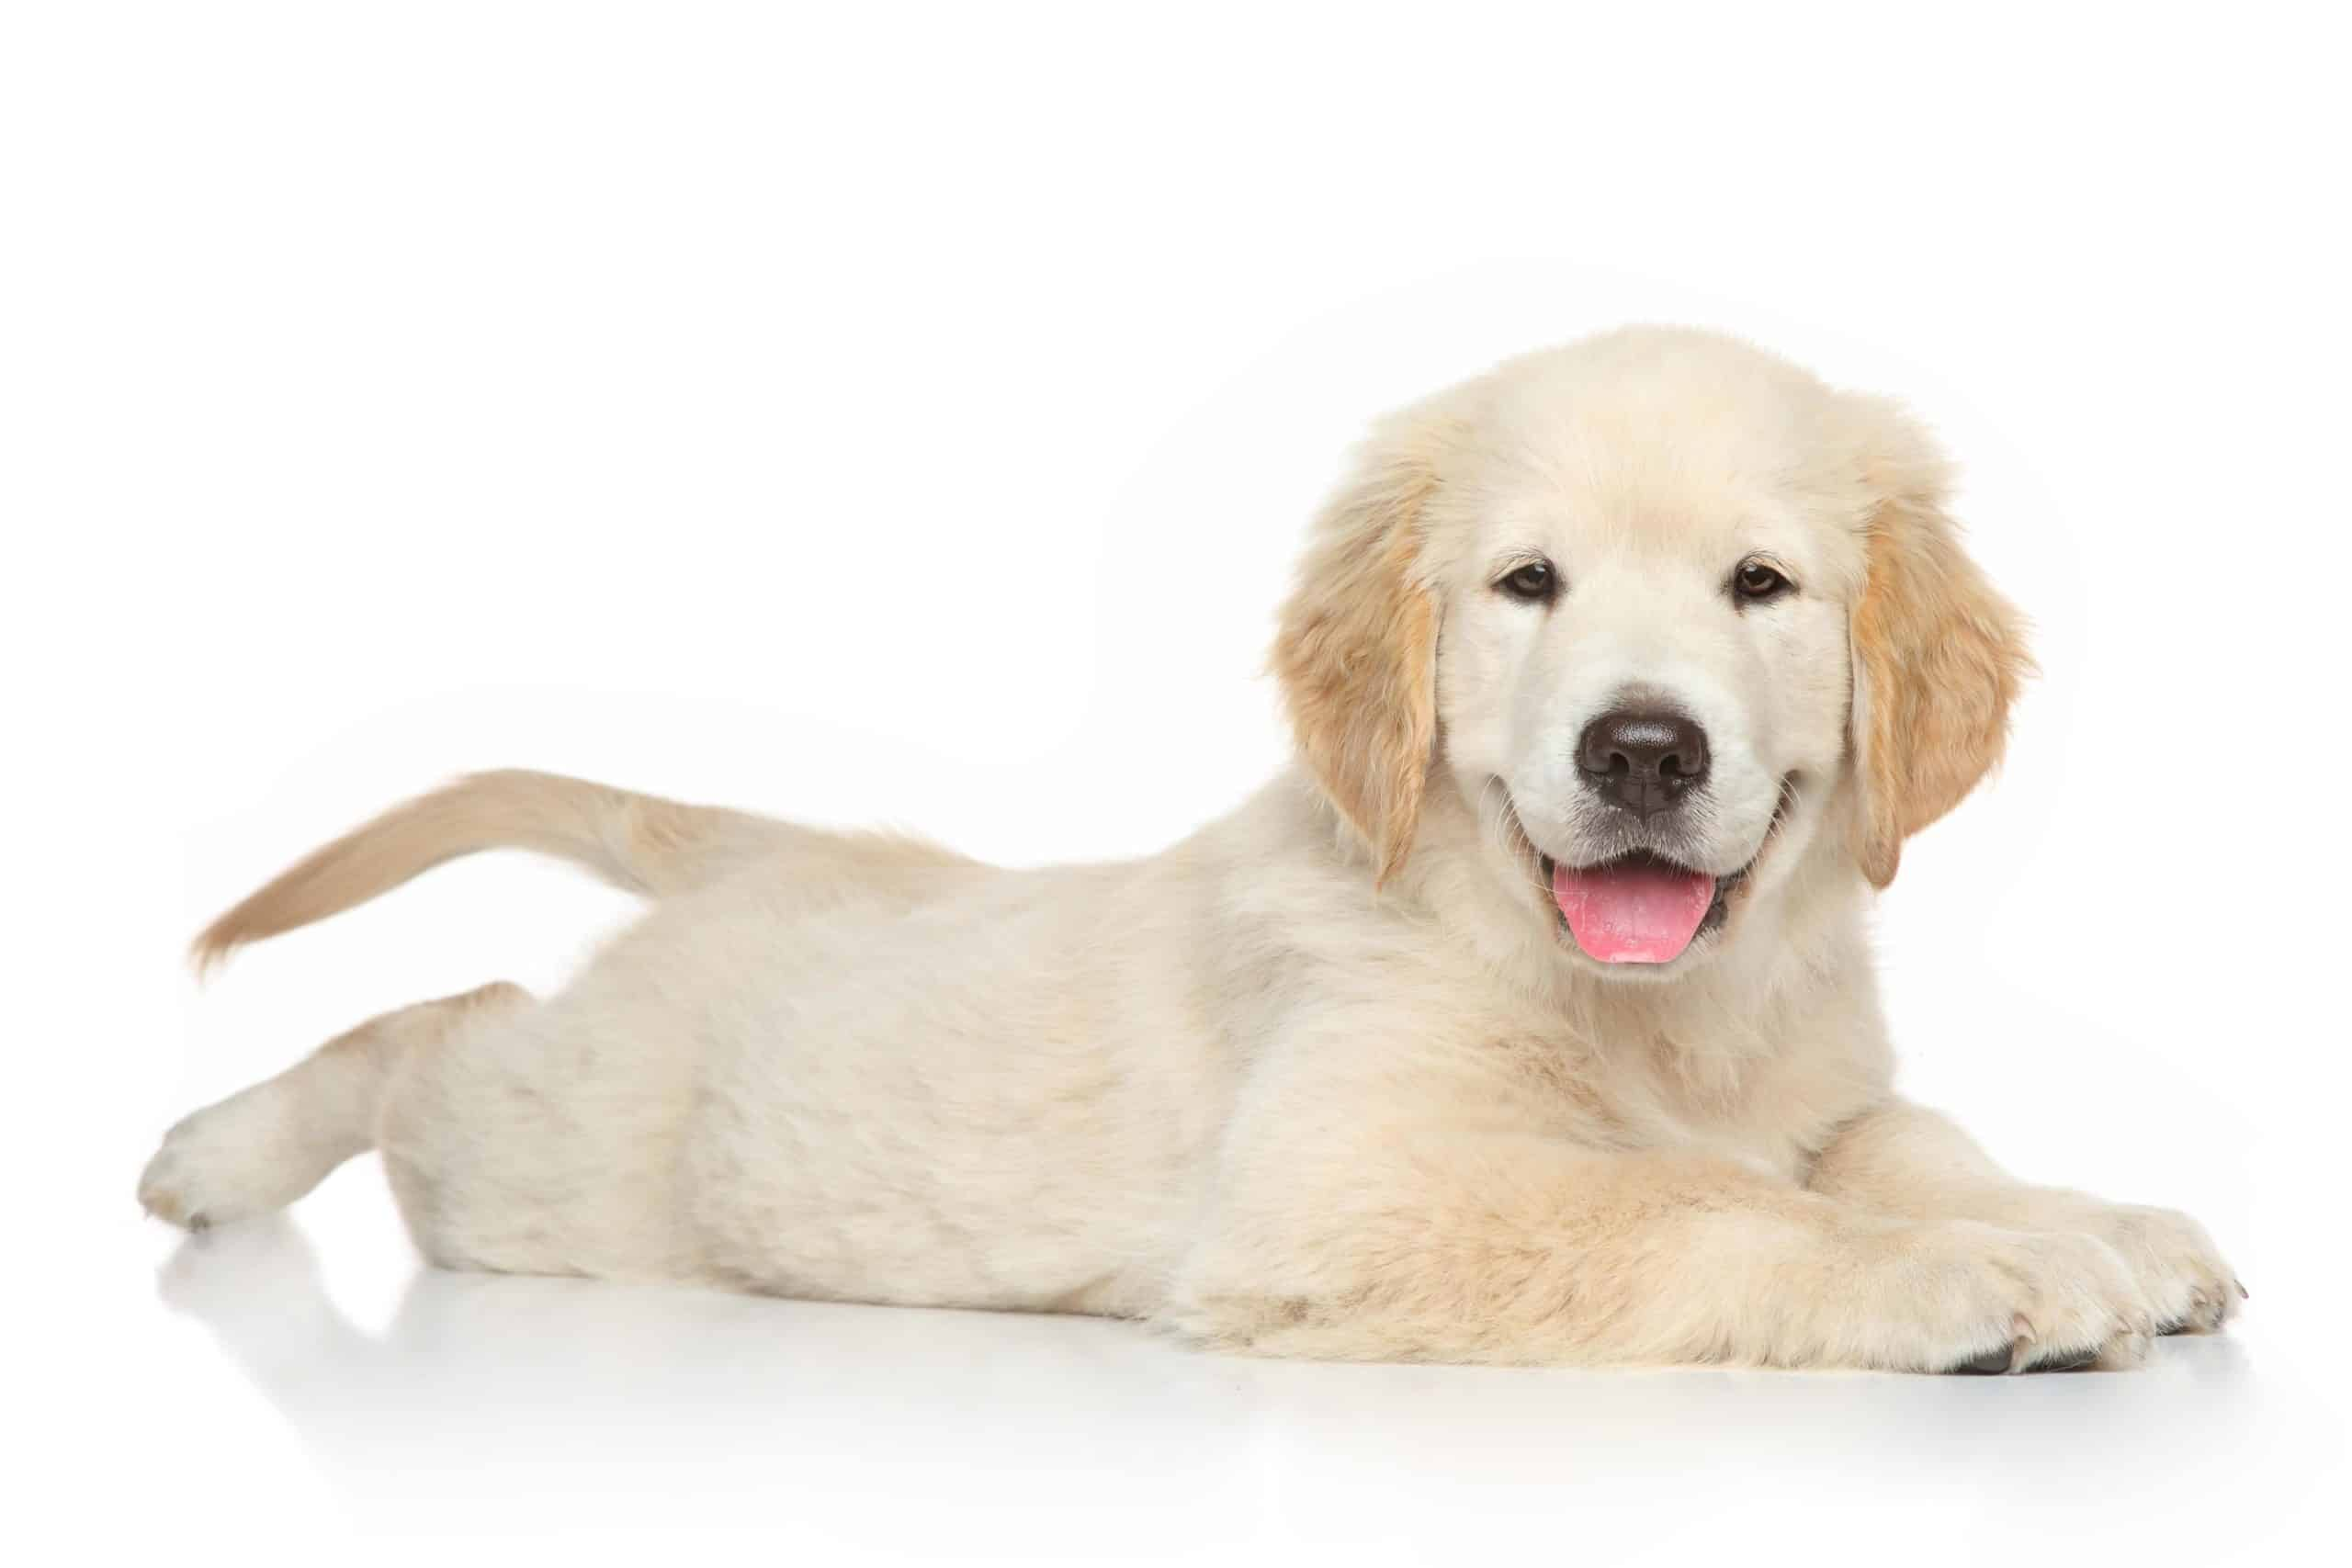 Cute, happy Golden Retriever puppy on white background.